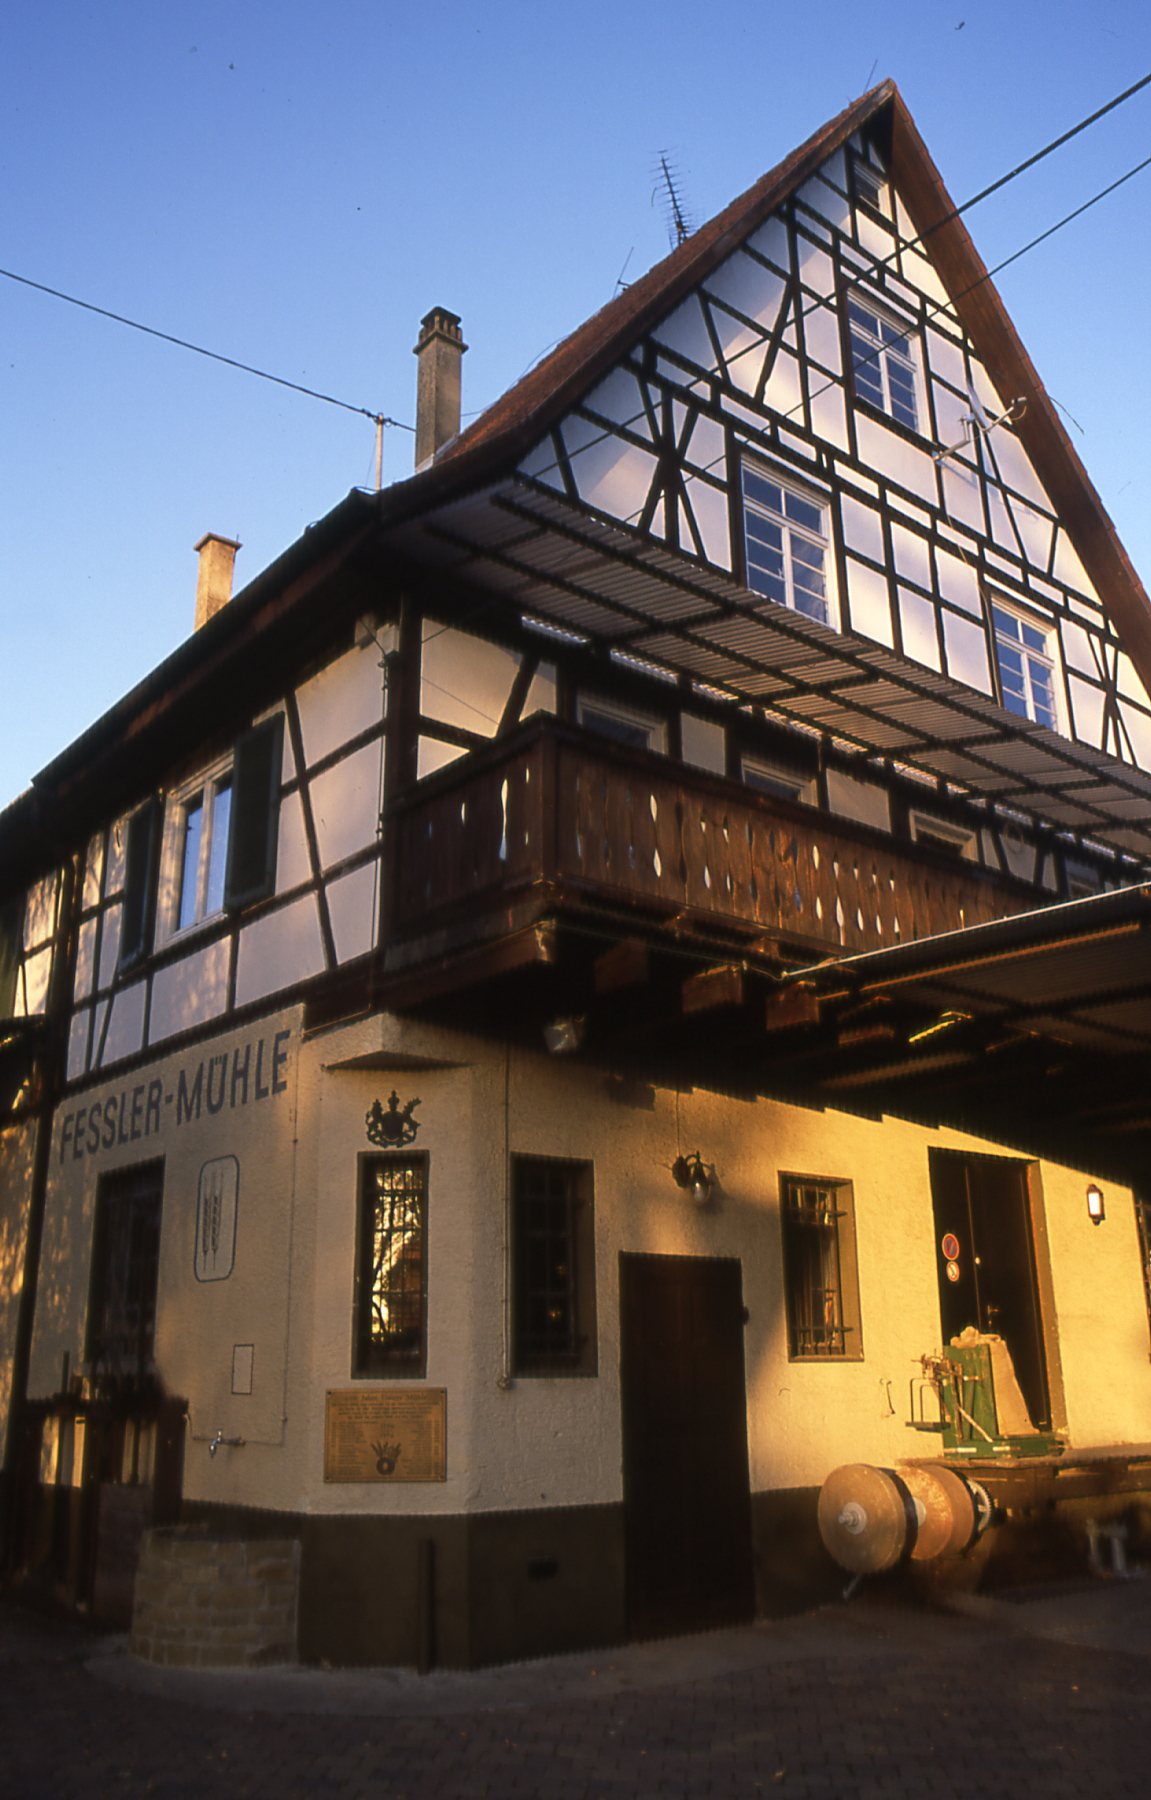 File:Fesser Mühle Sersheim.jpg  Wikimedia Commons